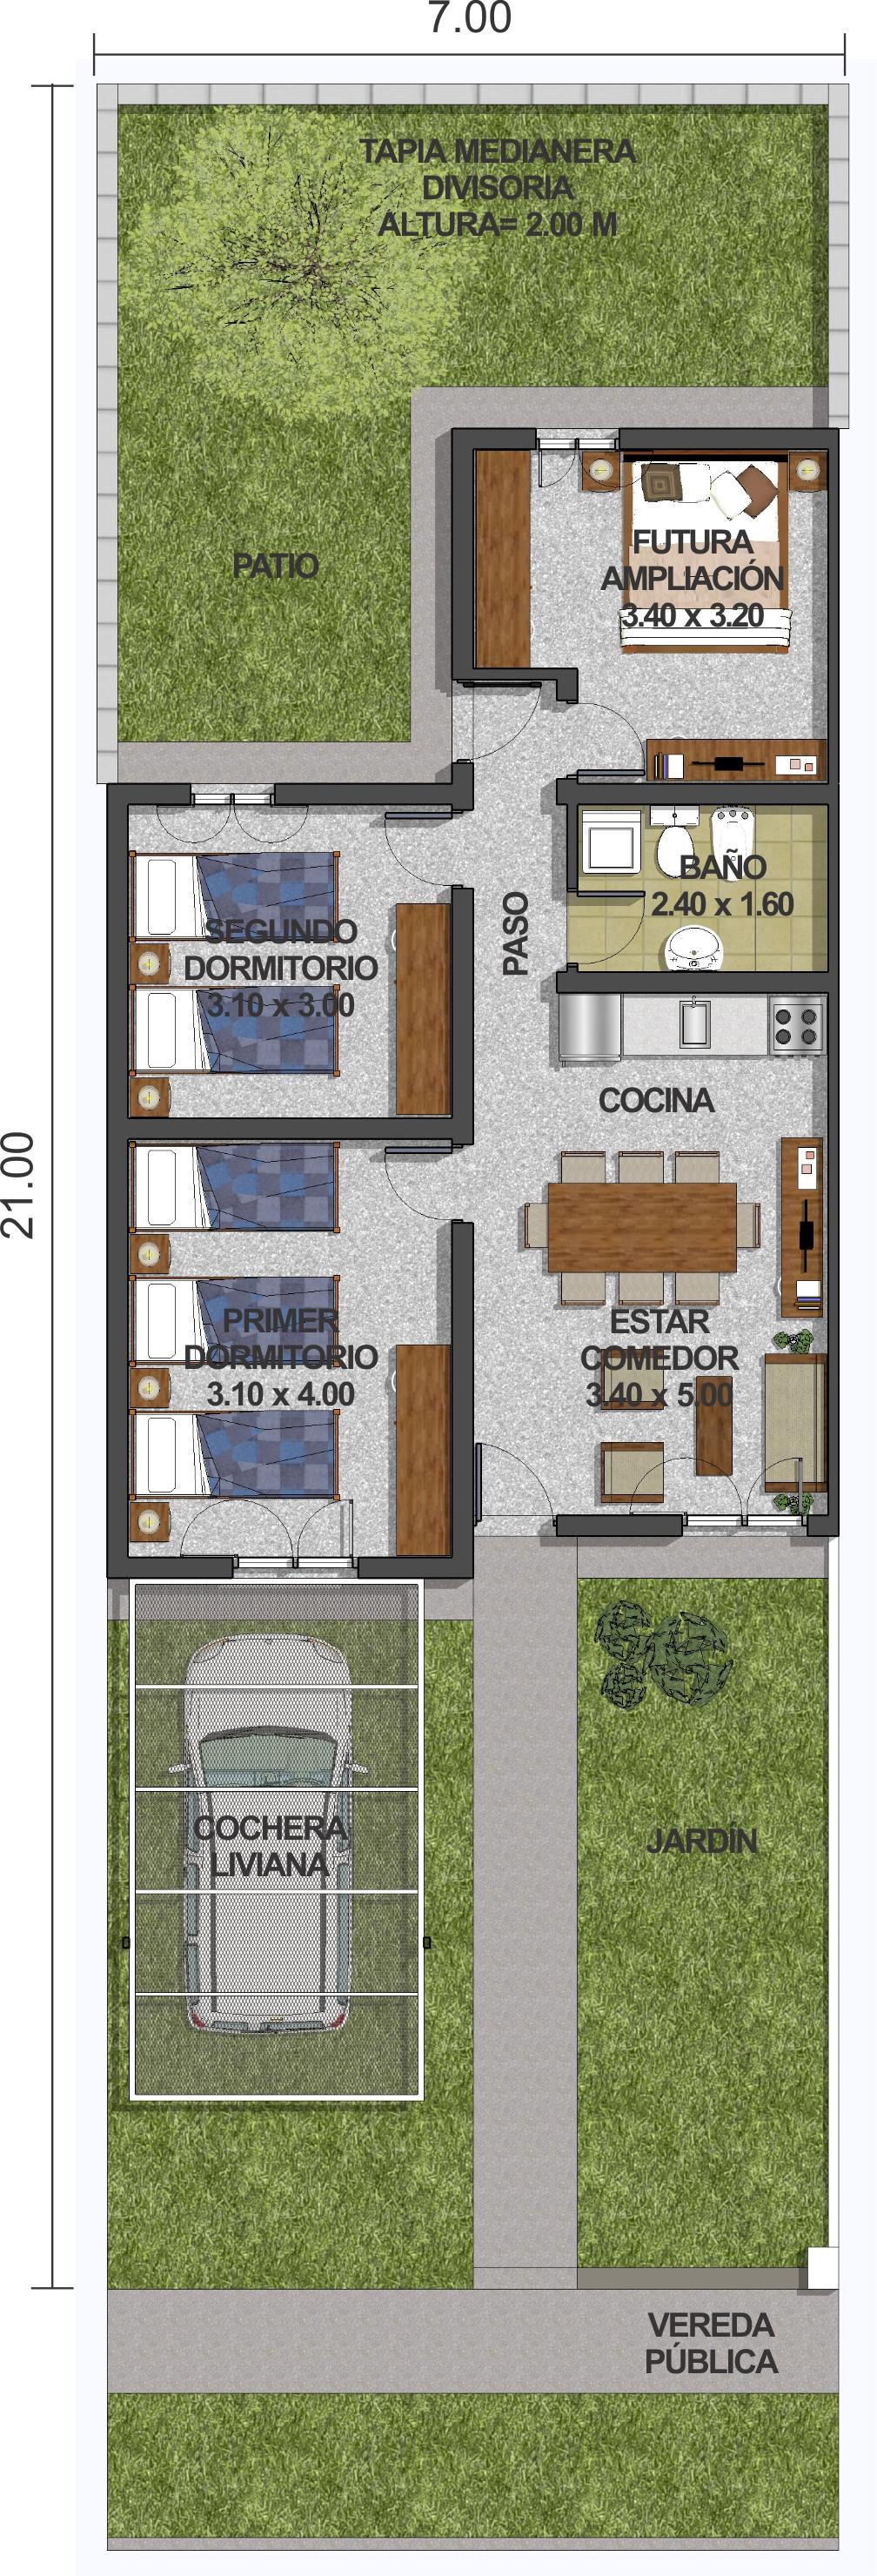 V-COMPACTA-3 dormitorios - futura ampliación_r1_c1